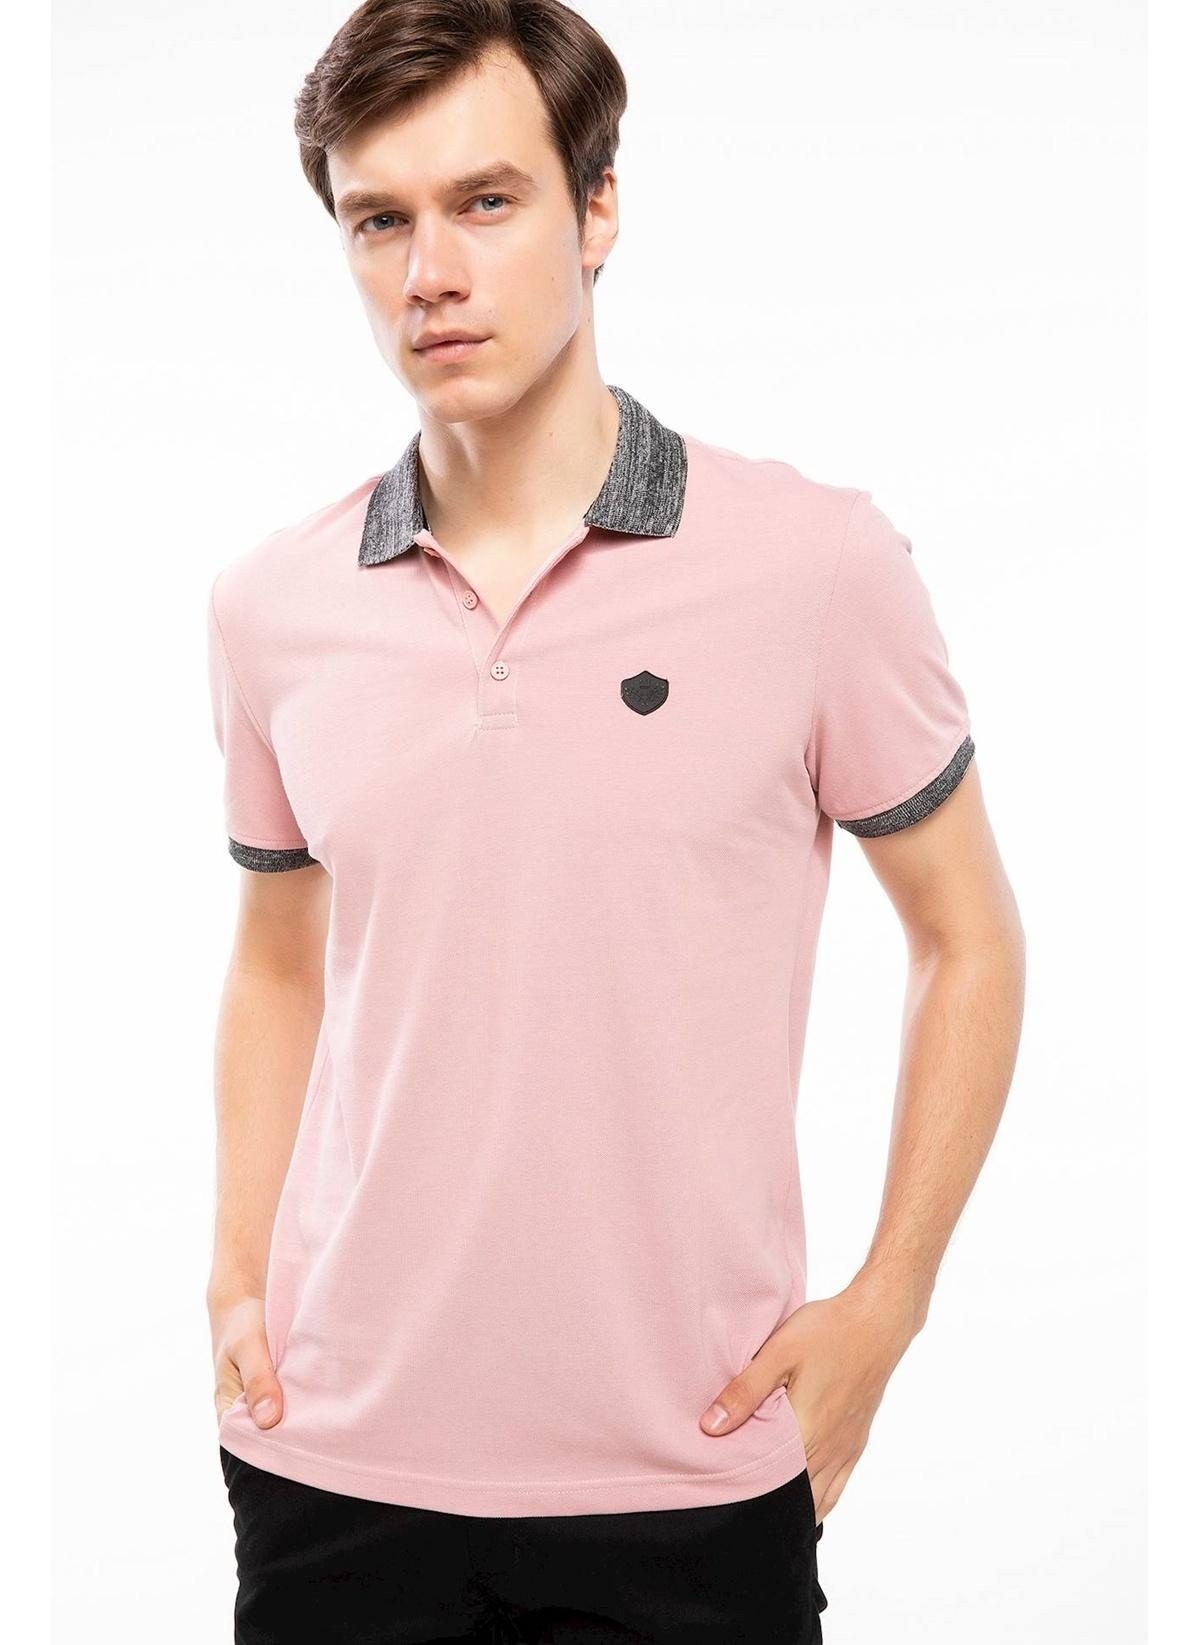 Defacto Yaka Detaylı Slim Fit Polo T-shirt J8359az18hspn368t-shirt – 29.99 TL